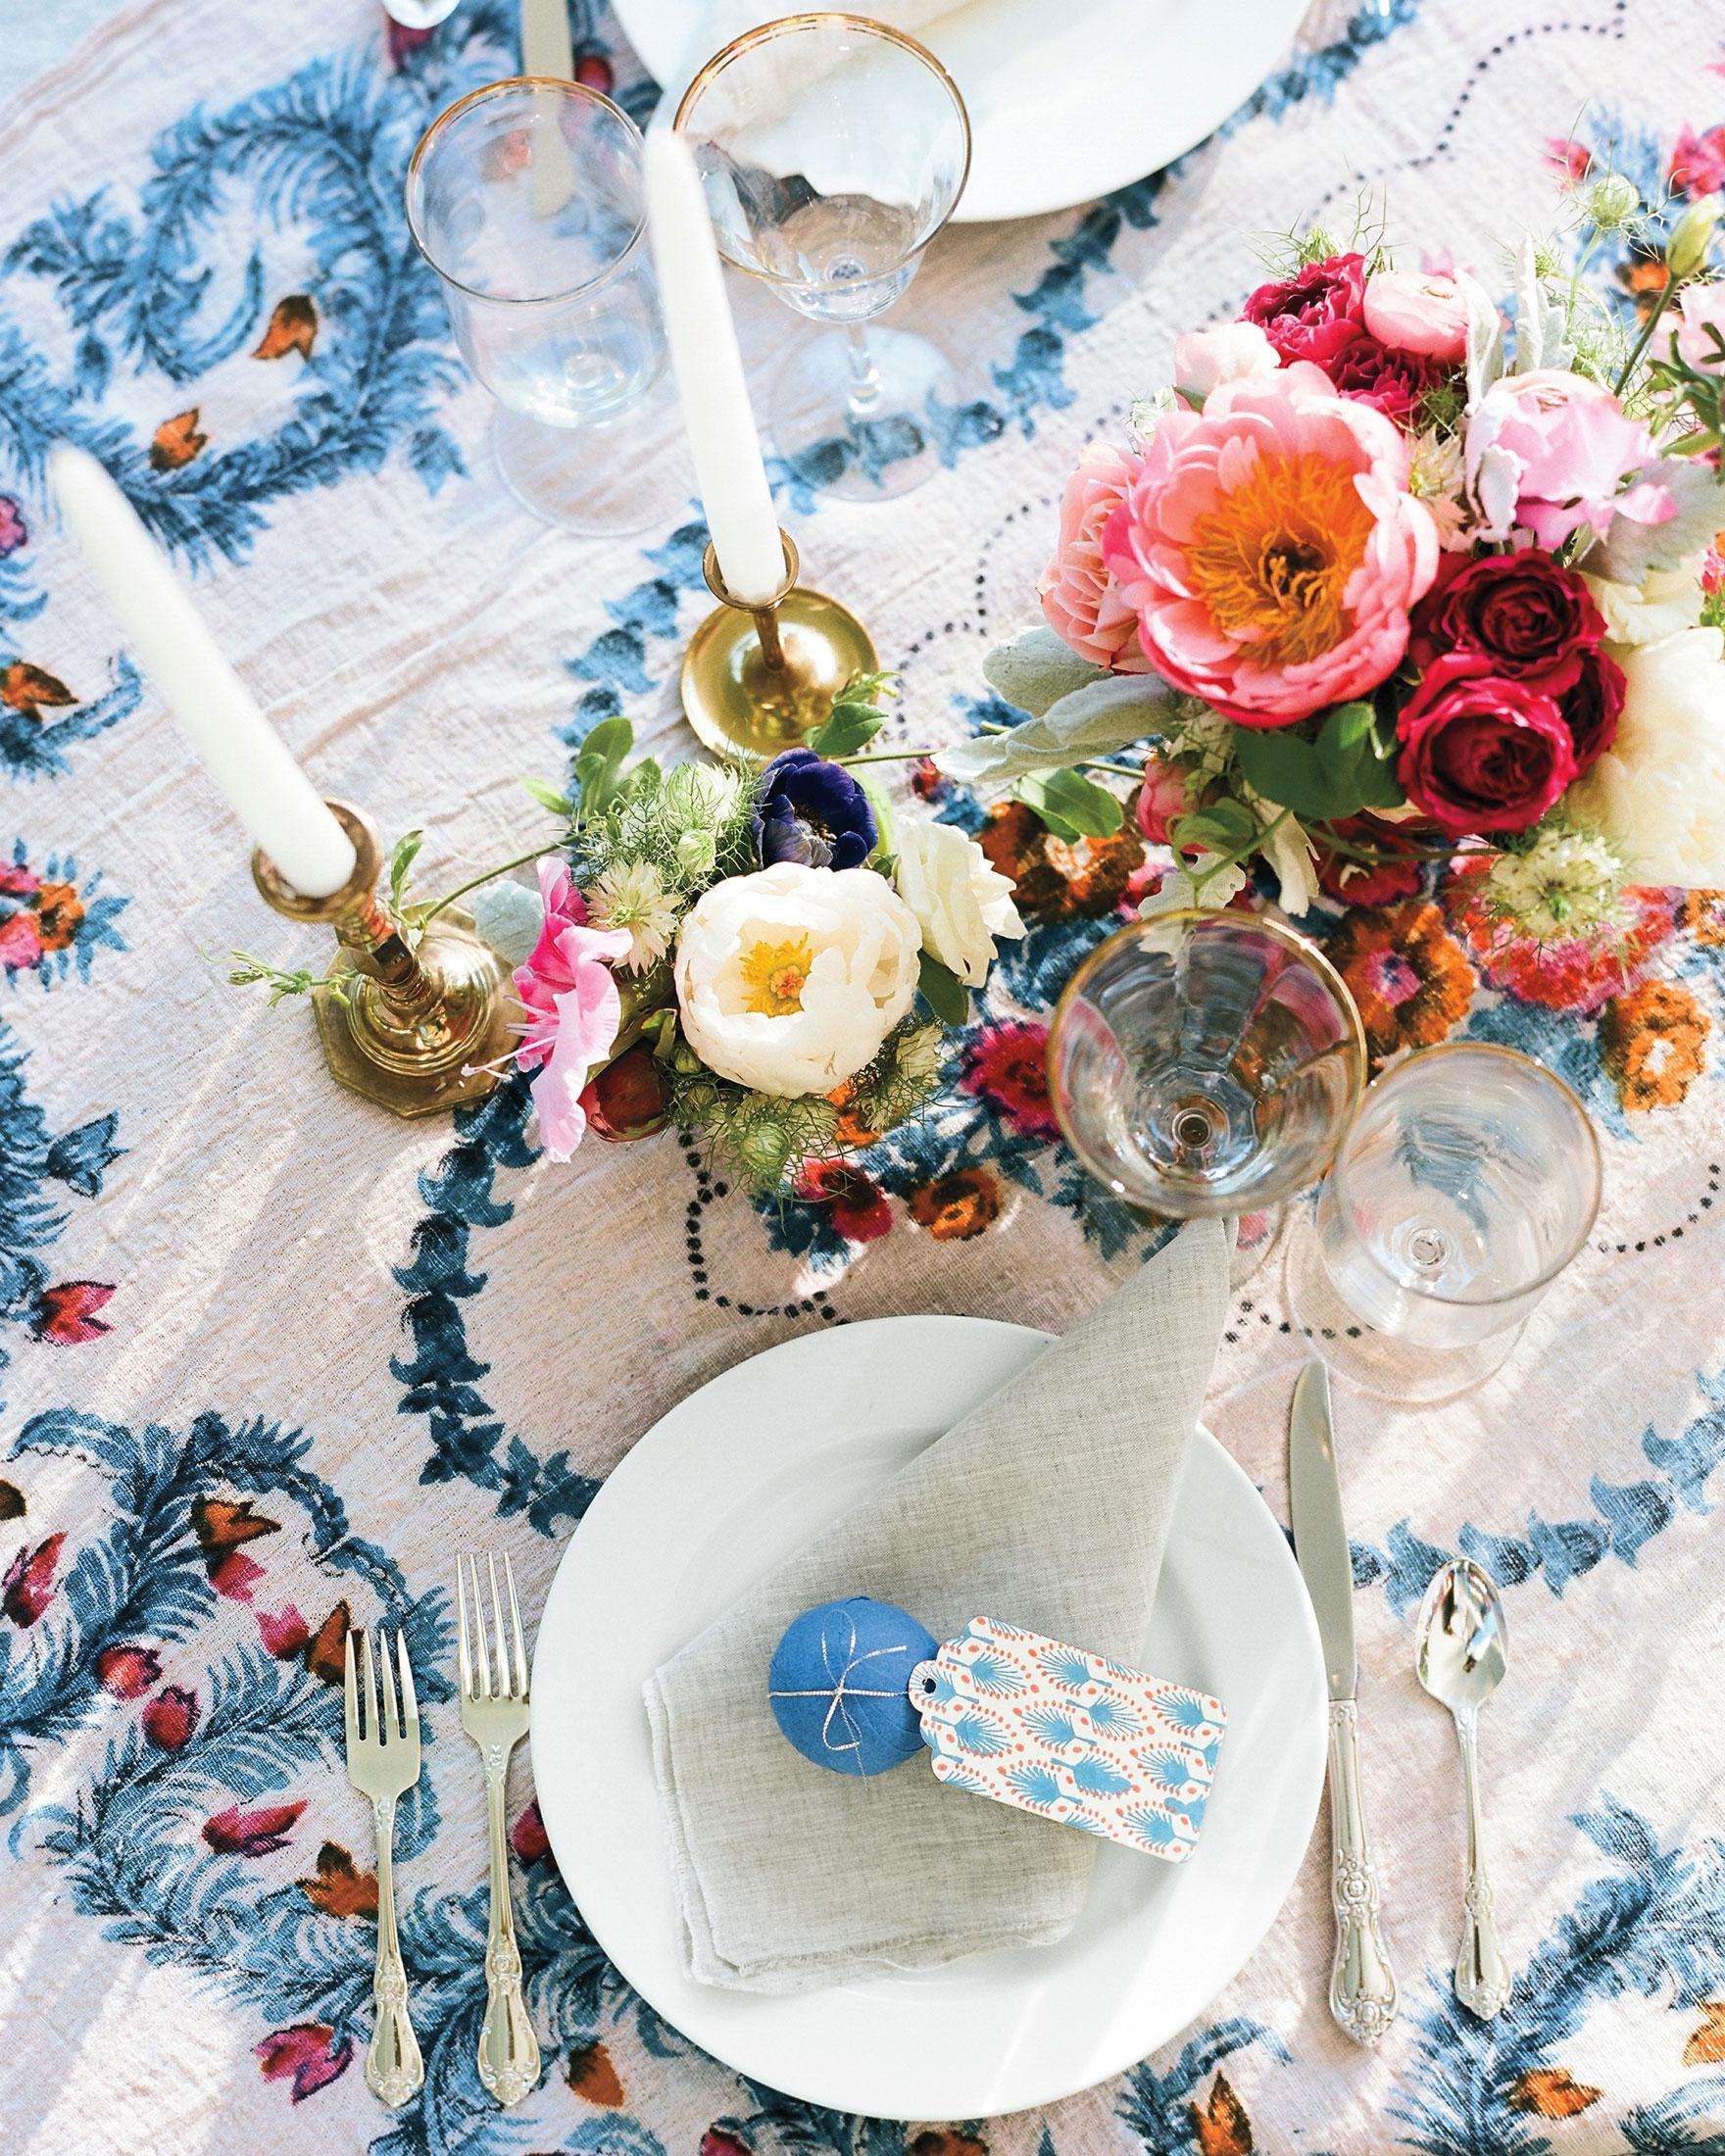 mfiona-peter-wedding-vermont-table-settings-9633.10r.2015.47-d112512.jpg